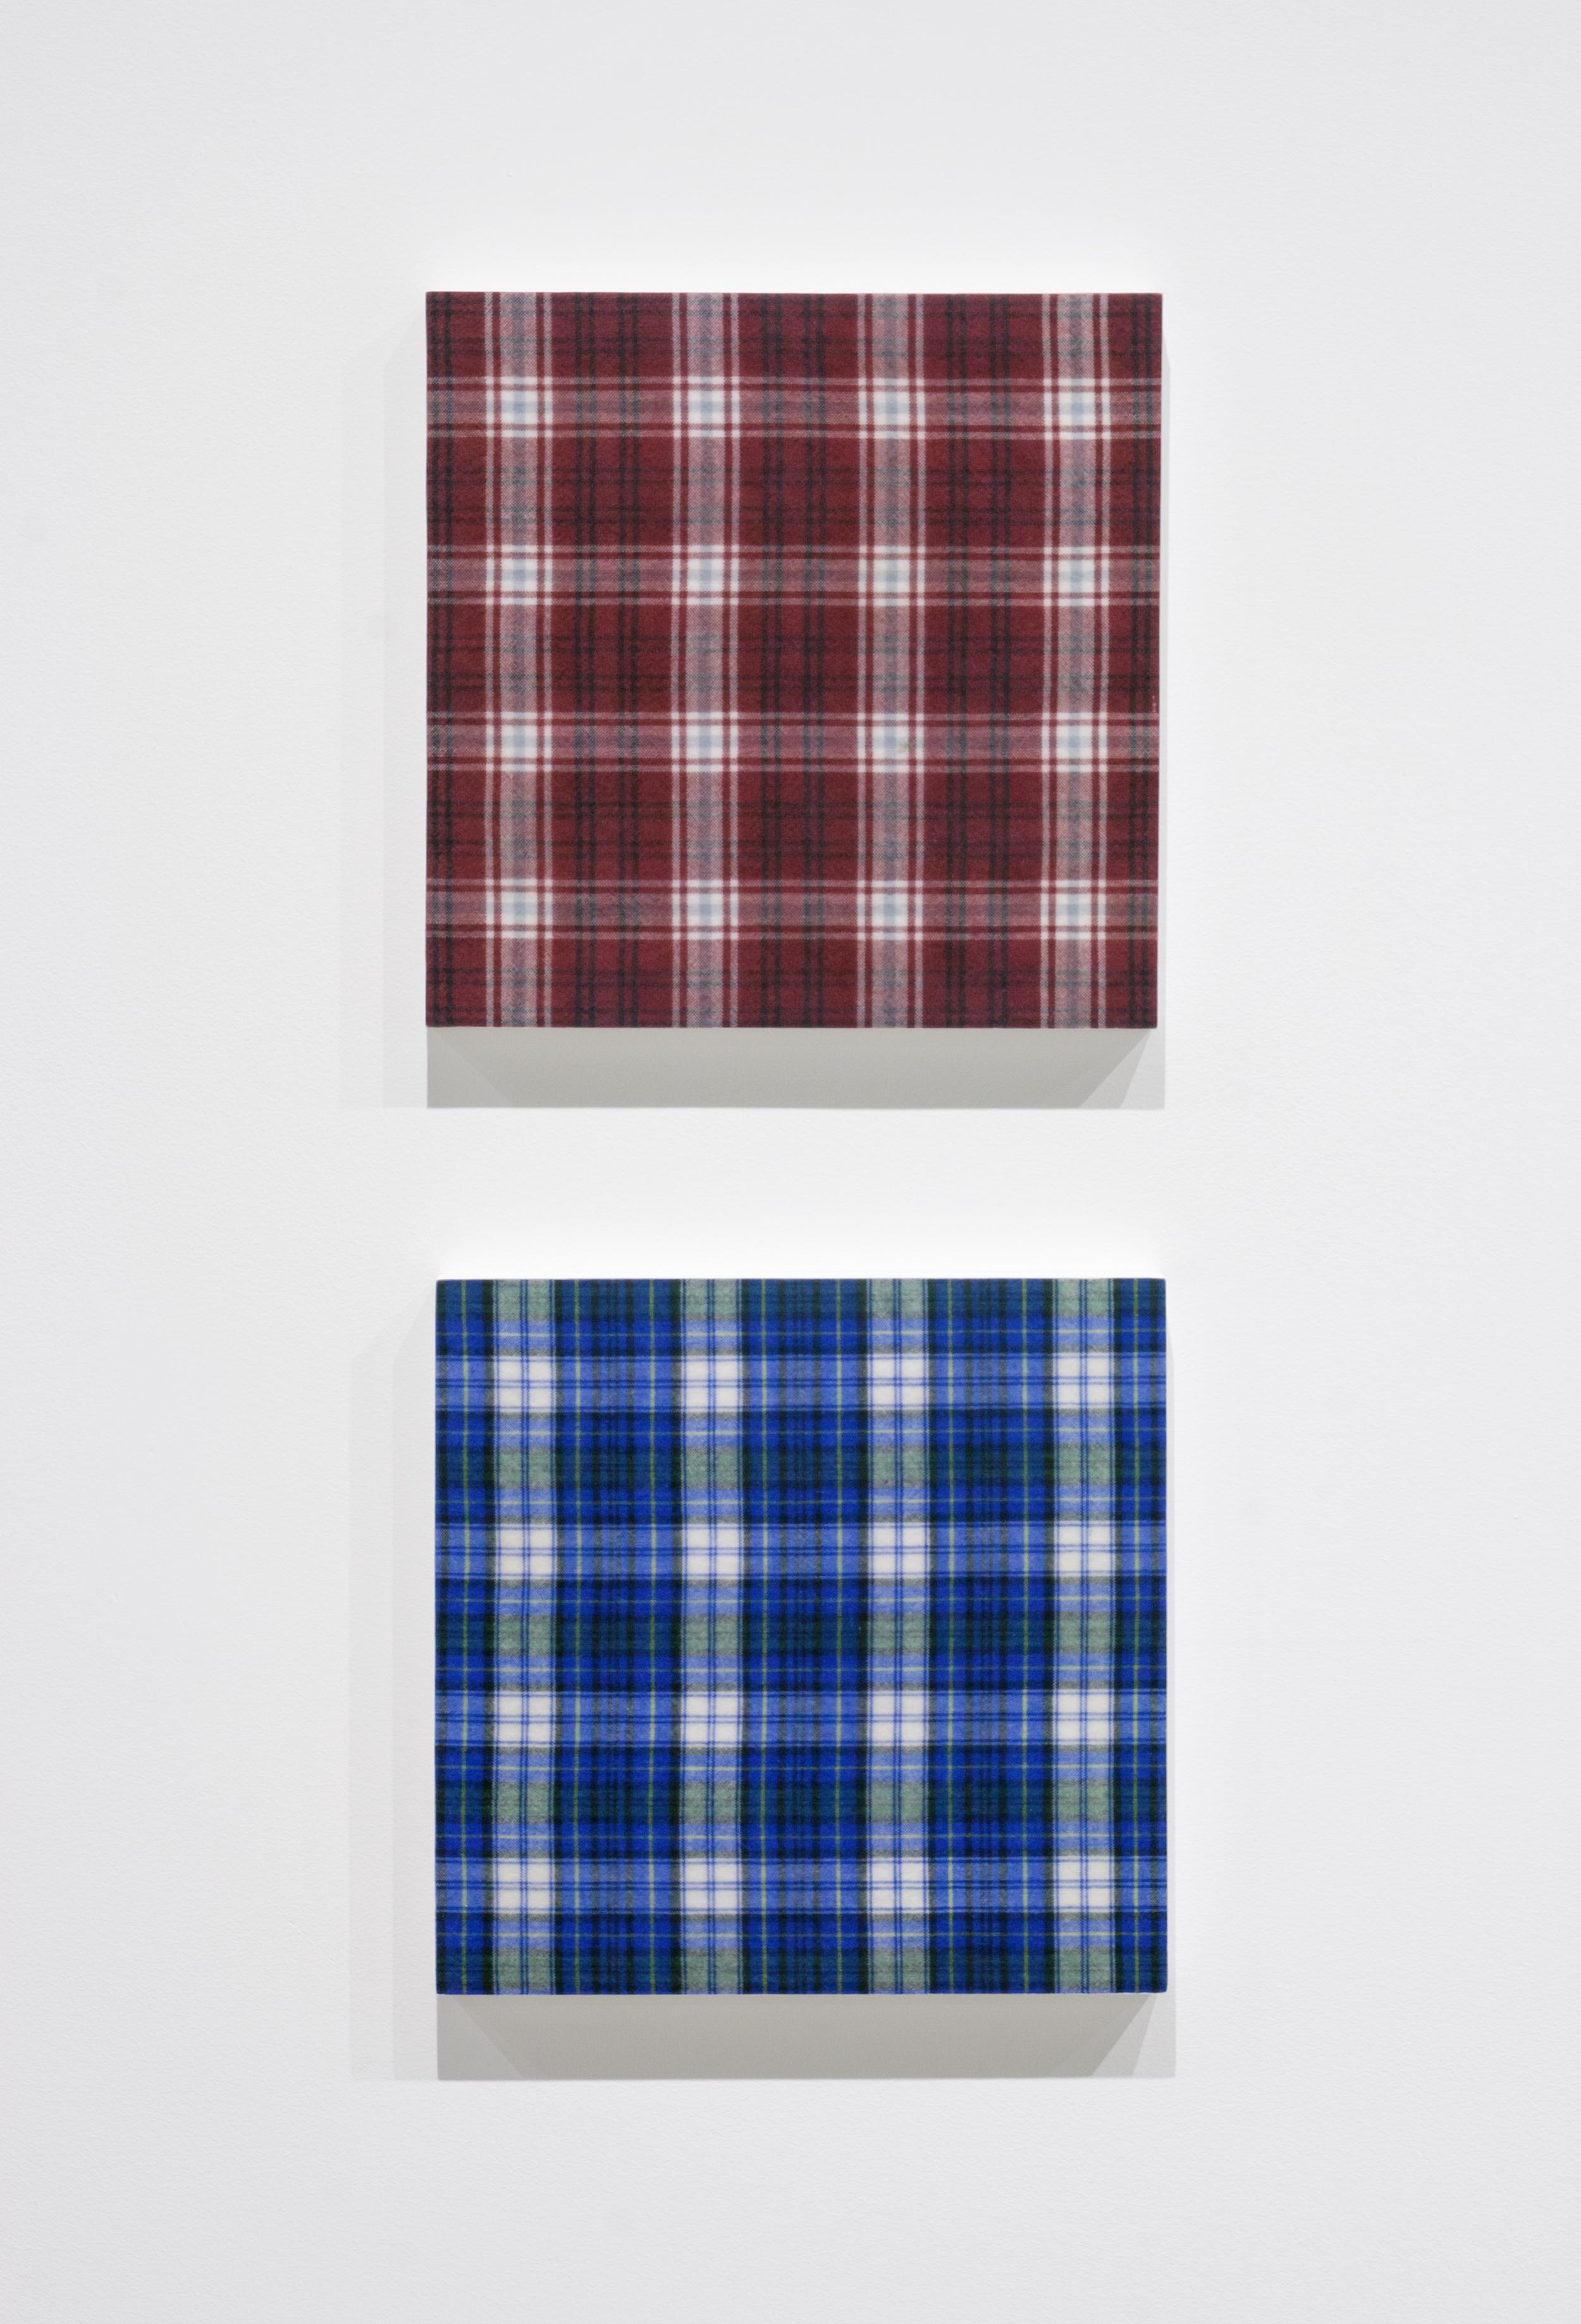 Shirt (Burgundy Plaid) , 2015,gel medium transfer on panel,25.5 x 25.5 cm (10 x 10 in); Shirt (Blue Plaid) , 2015,gel medium transfer on panel,25.5 x 25.5 cm (10 x 10 in)